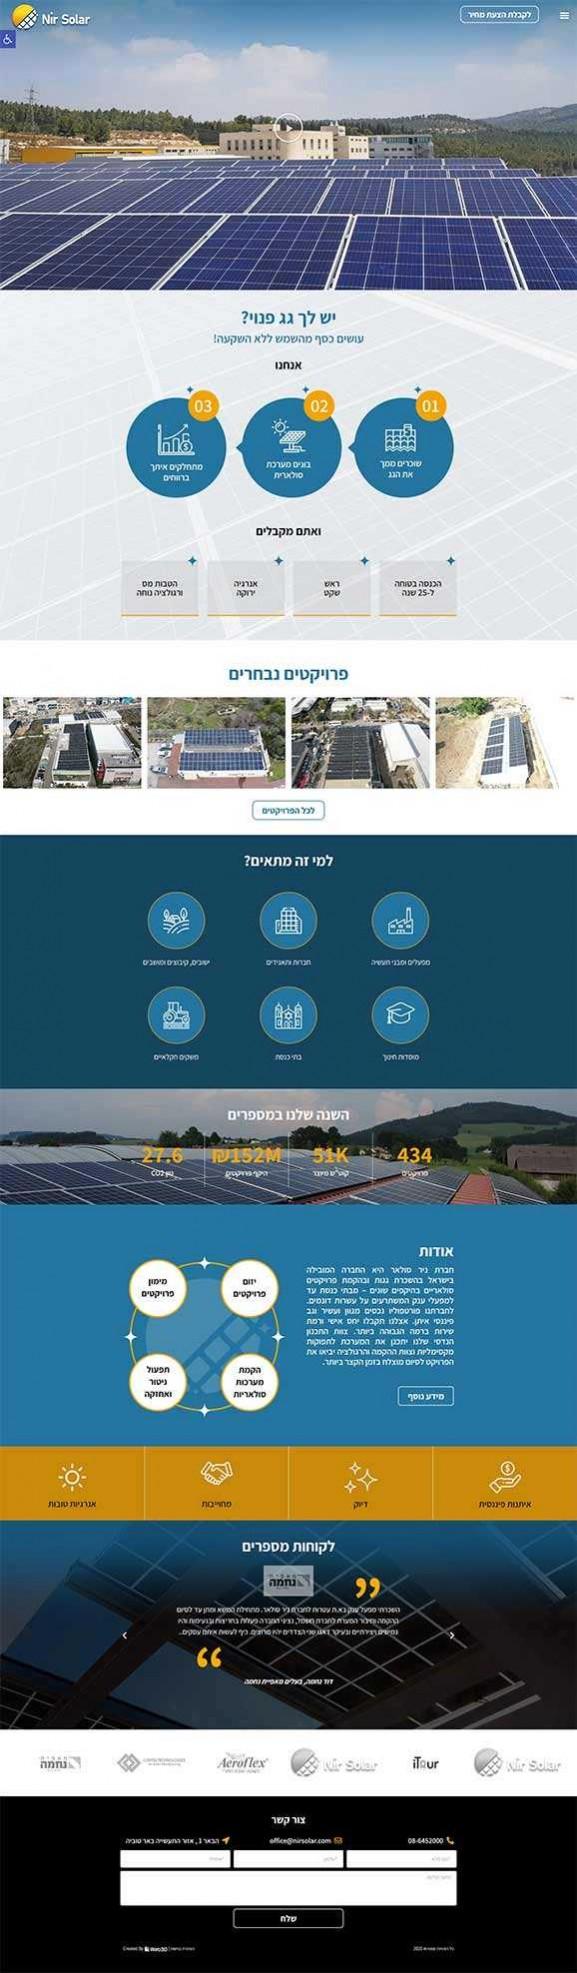 עיצוב אתר אינטרנט ניר סולאר